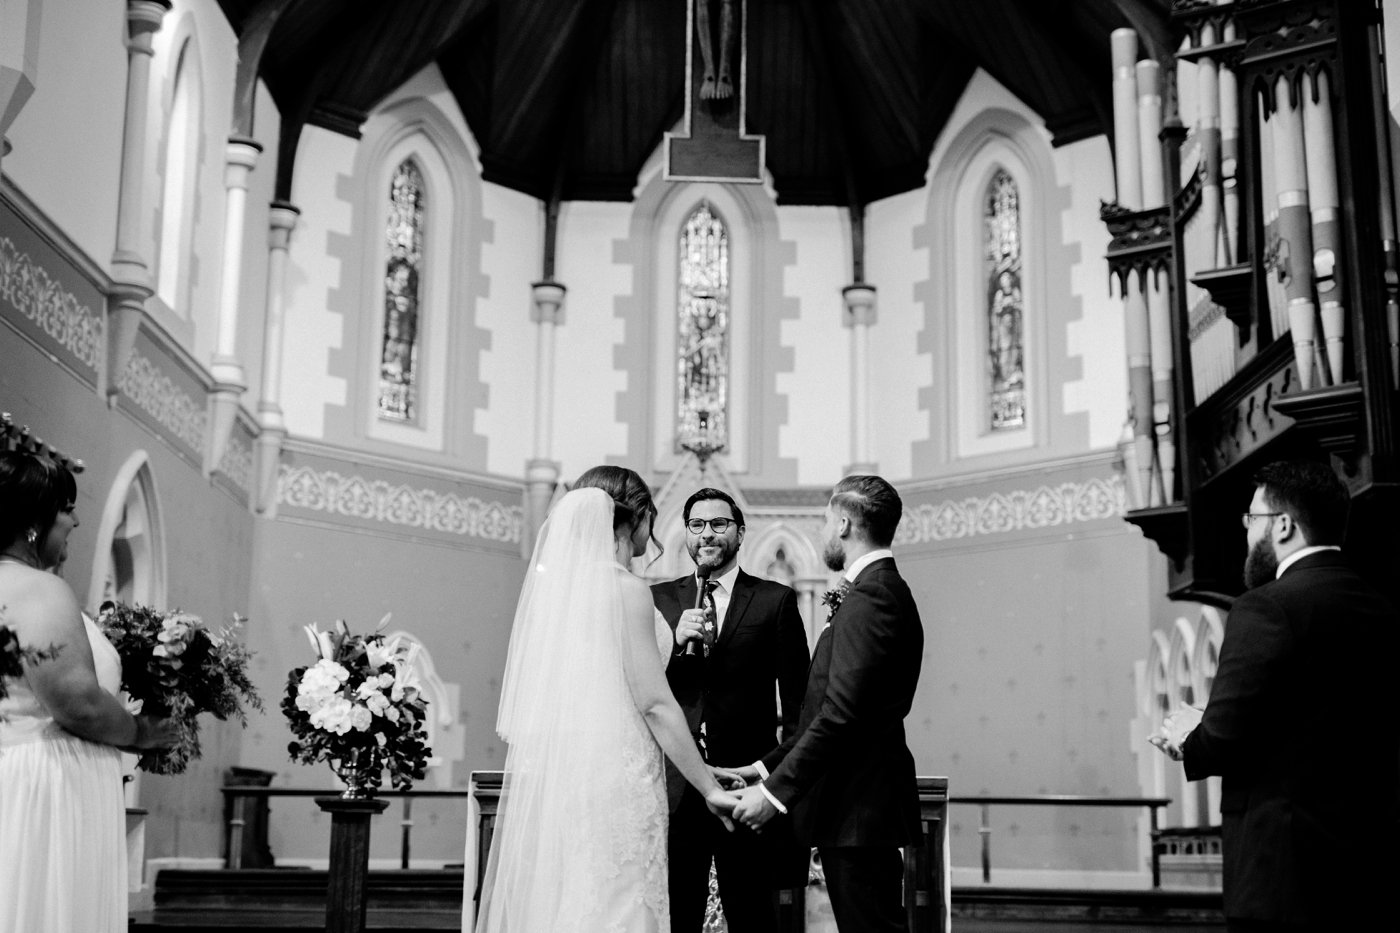 Erin & Ryan - Natural Wedding Photographer in Adelaide - Maximillians Wedding - Simple and Modern Wedding Photographer - Katherine Schultz - www.katherineschultzphotography.com_0022.jpg